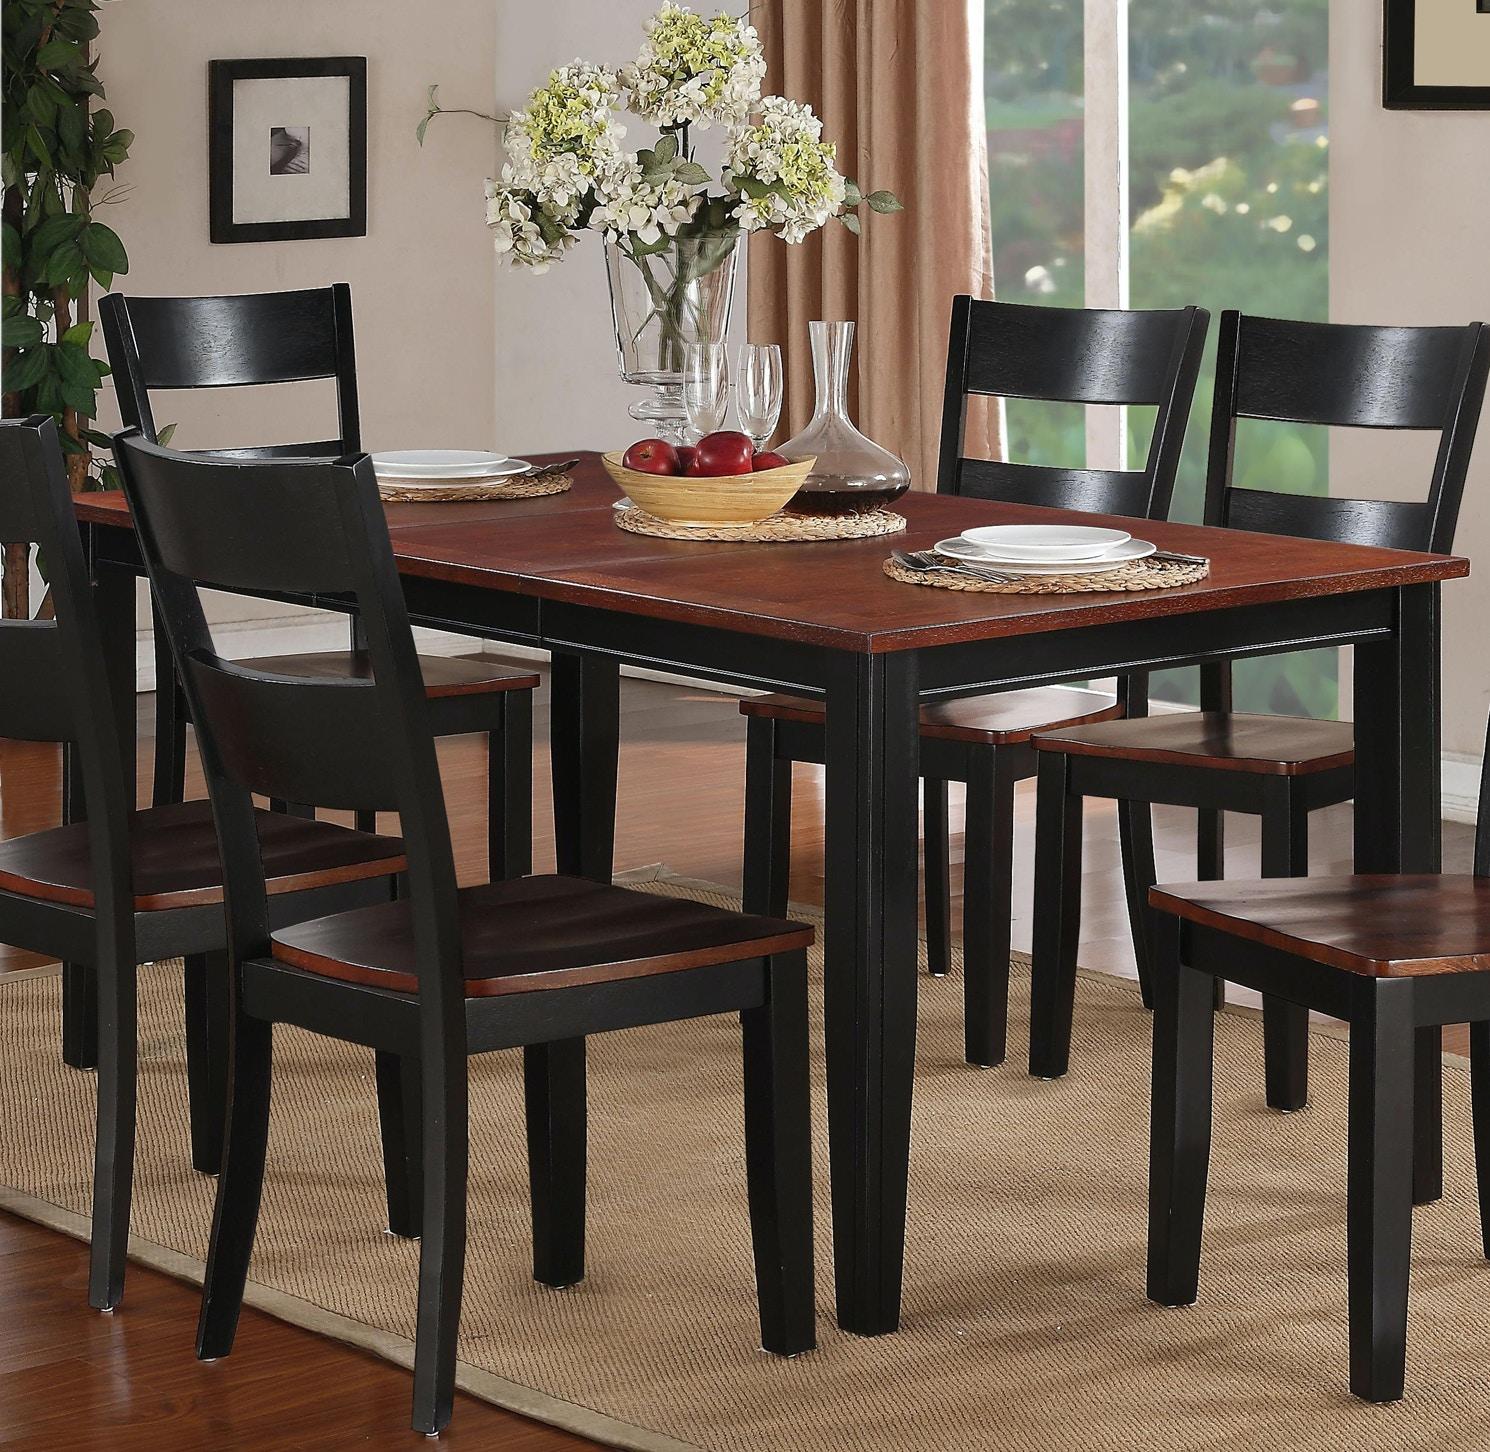 Holland House Findlay Dining Set 508511